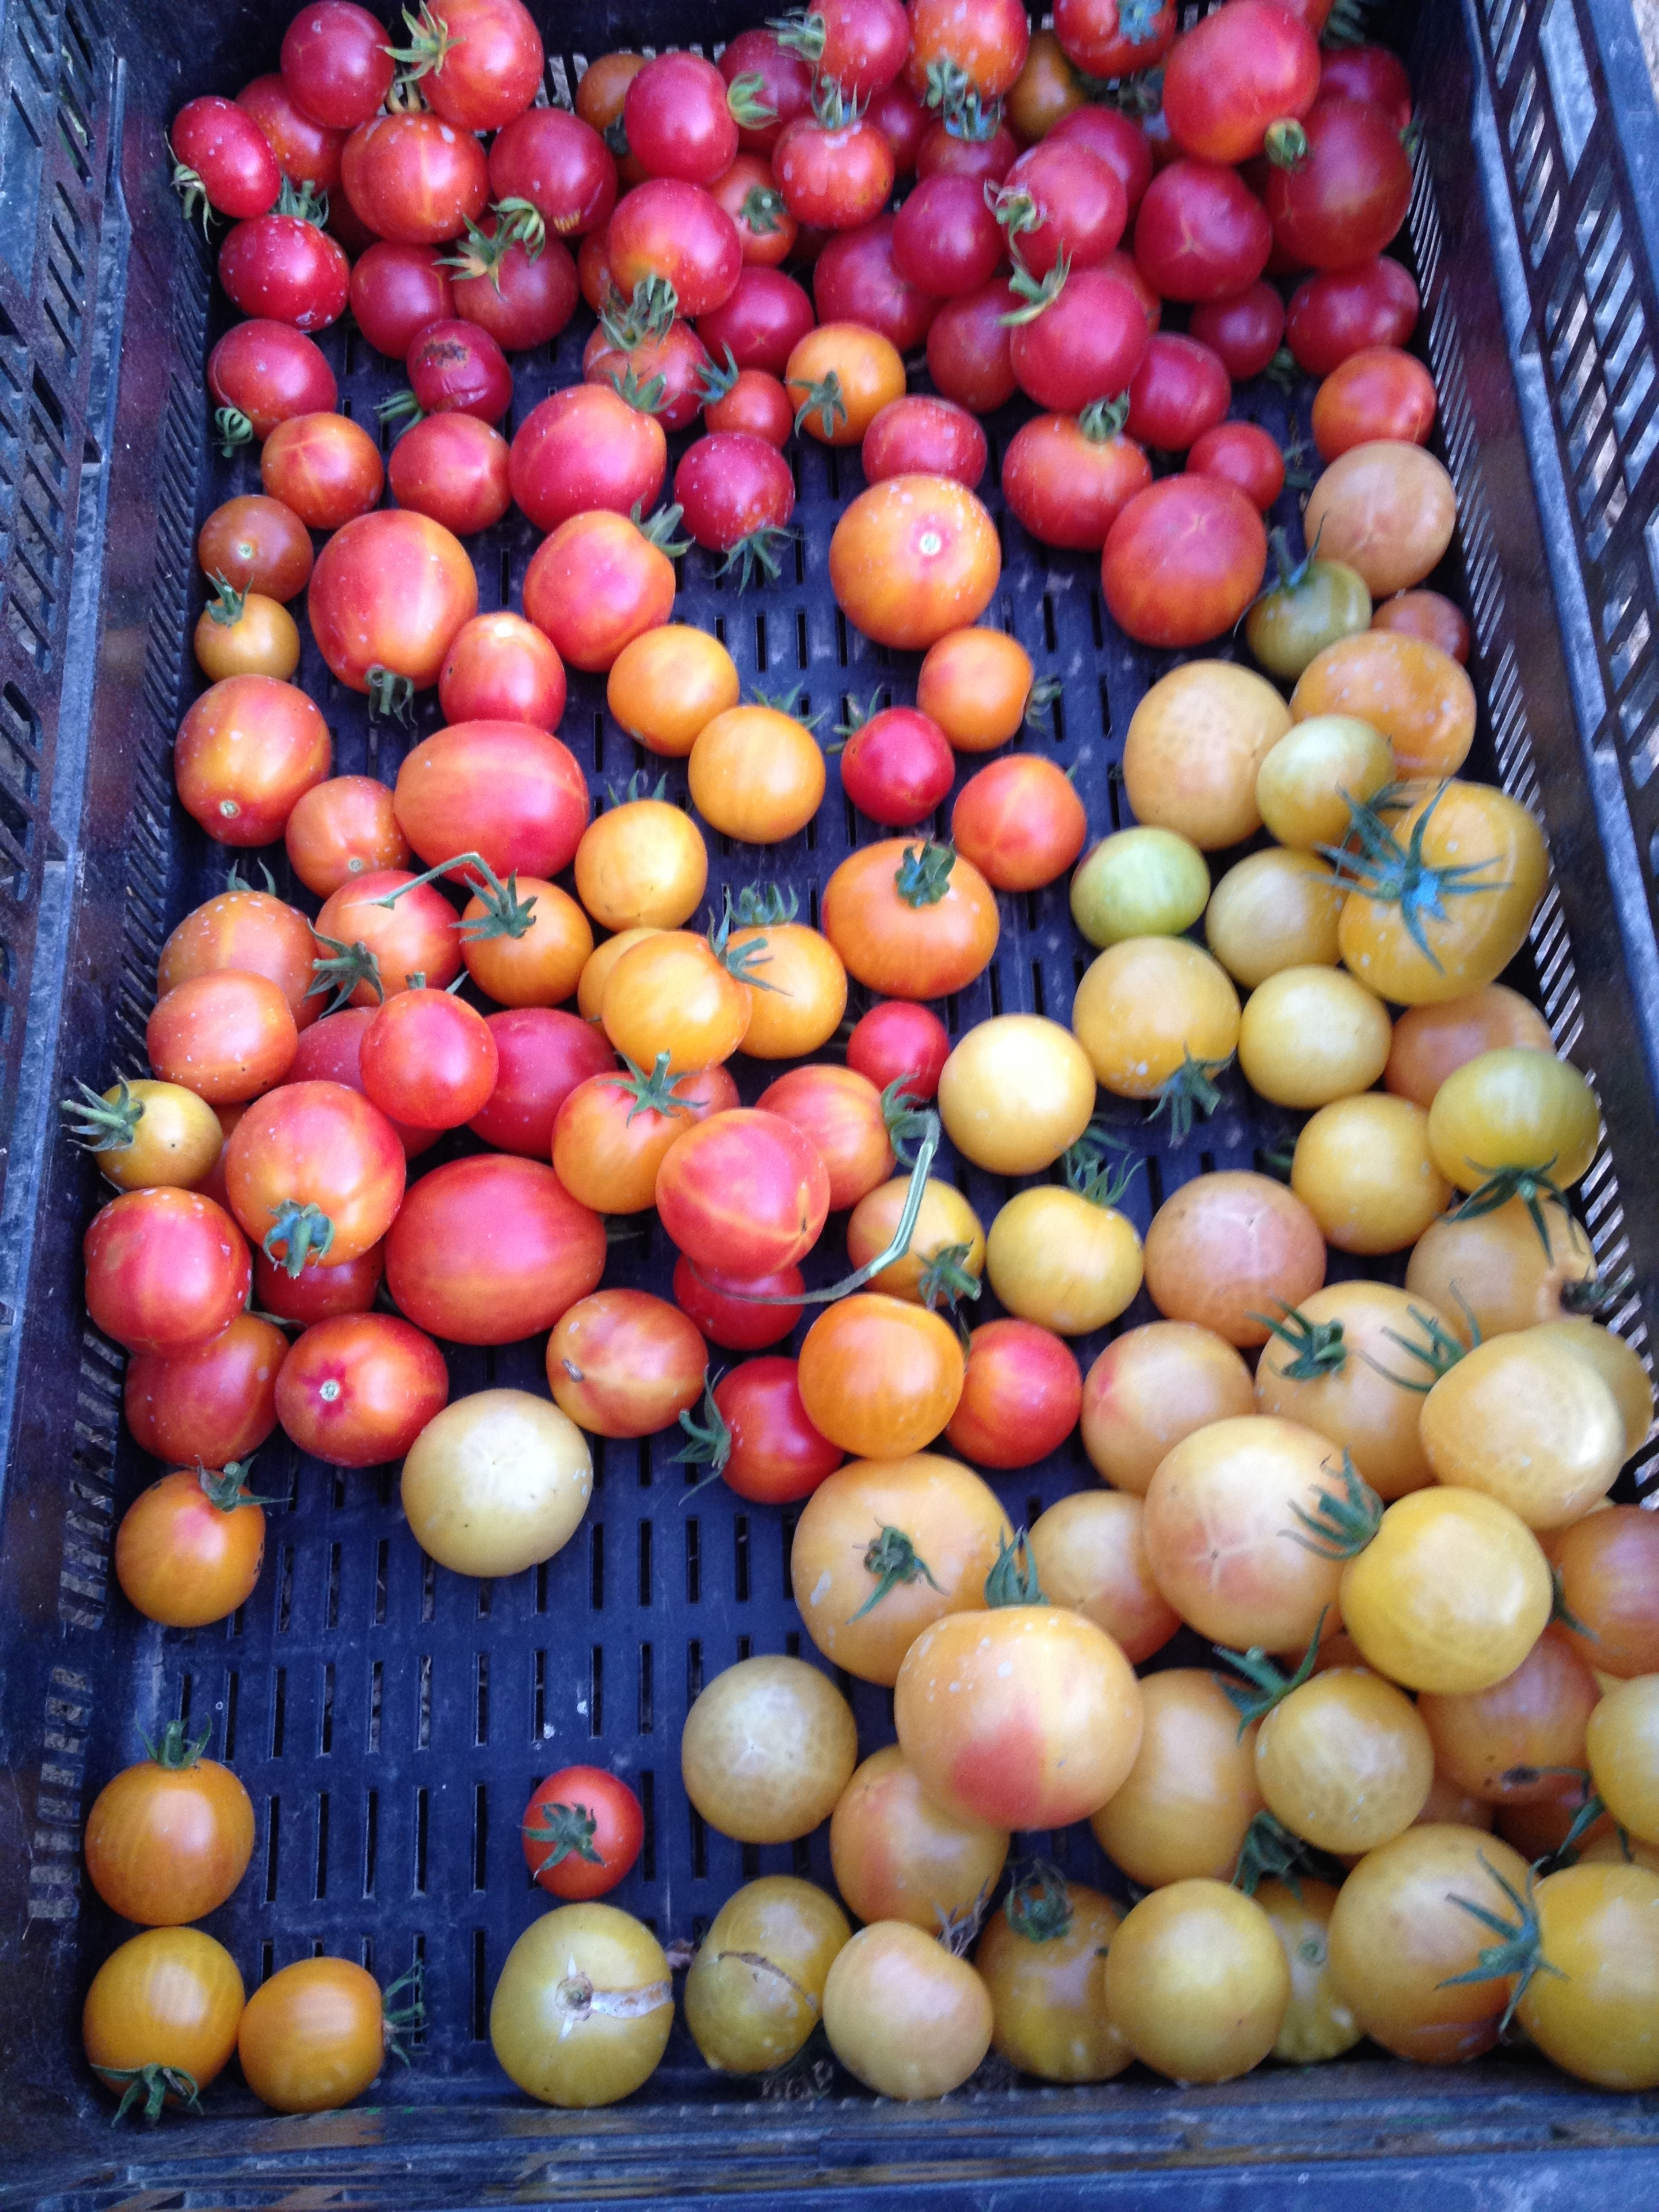 gajo de melon segregating into colors.jpg